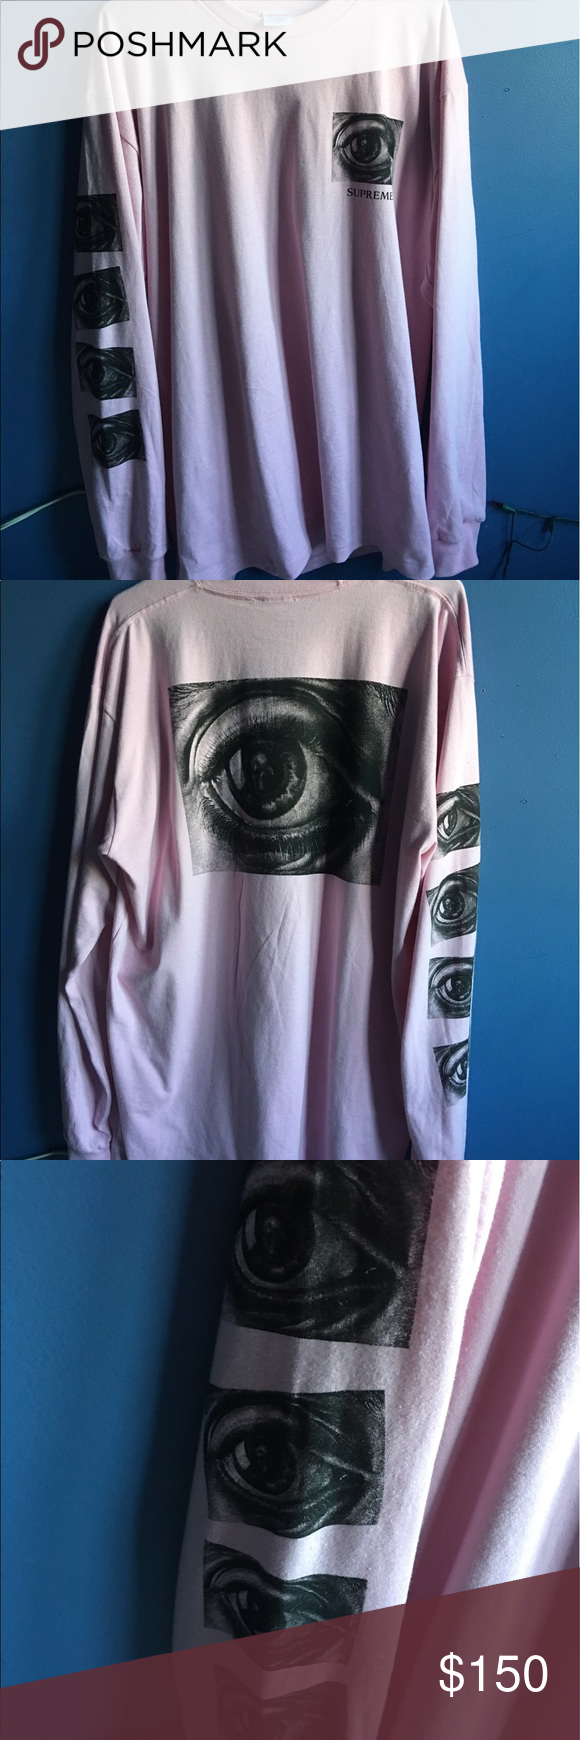 e3c6194b25c3 NWOT Supreme MC Escher Pink Eye Long Sleeve Shirt Authentic Supreme MC  Escher Pink Eye Long Sleeve Tee Shirt Size XL Released in April 2017 10/10  NEW ...